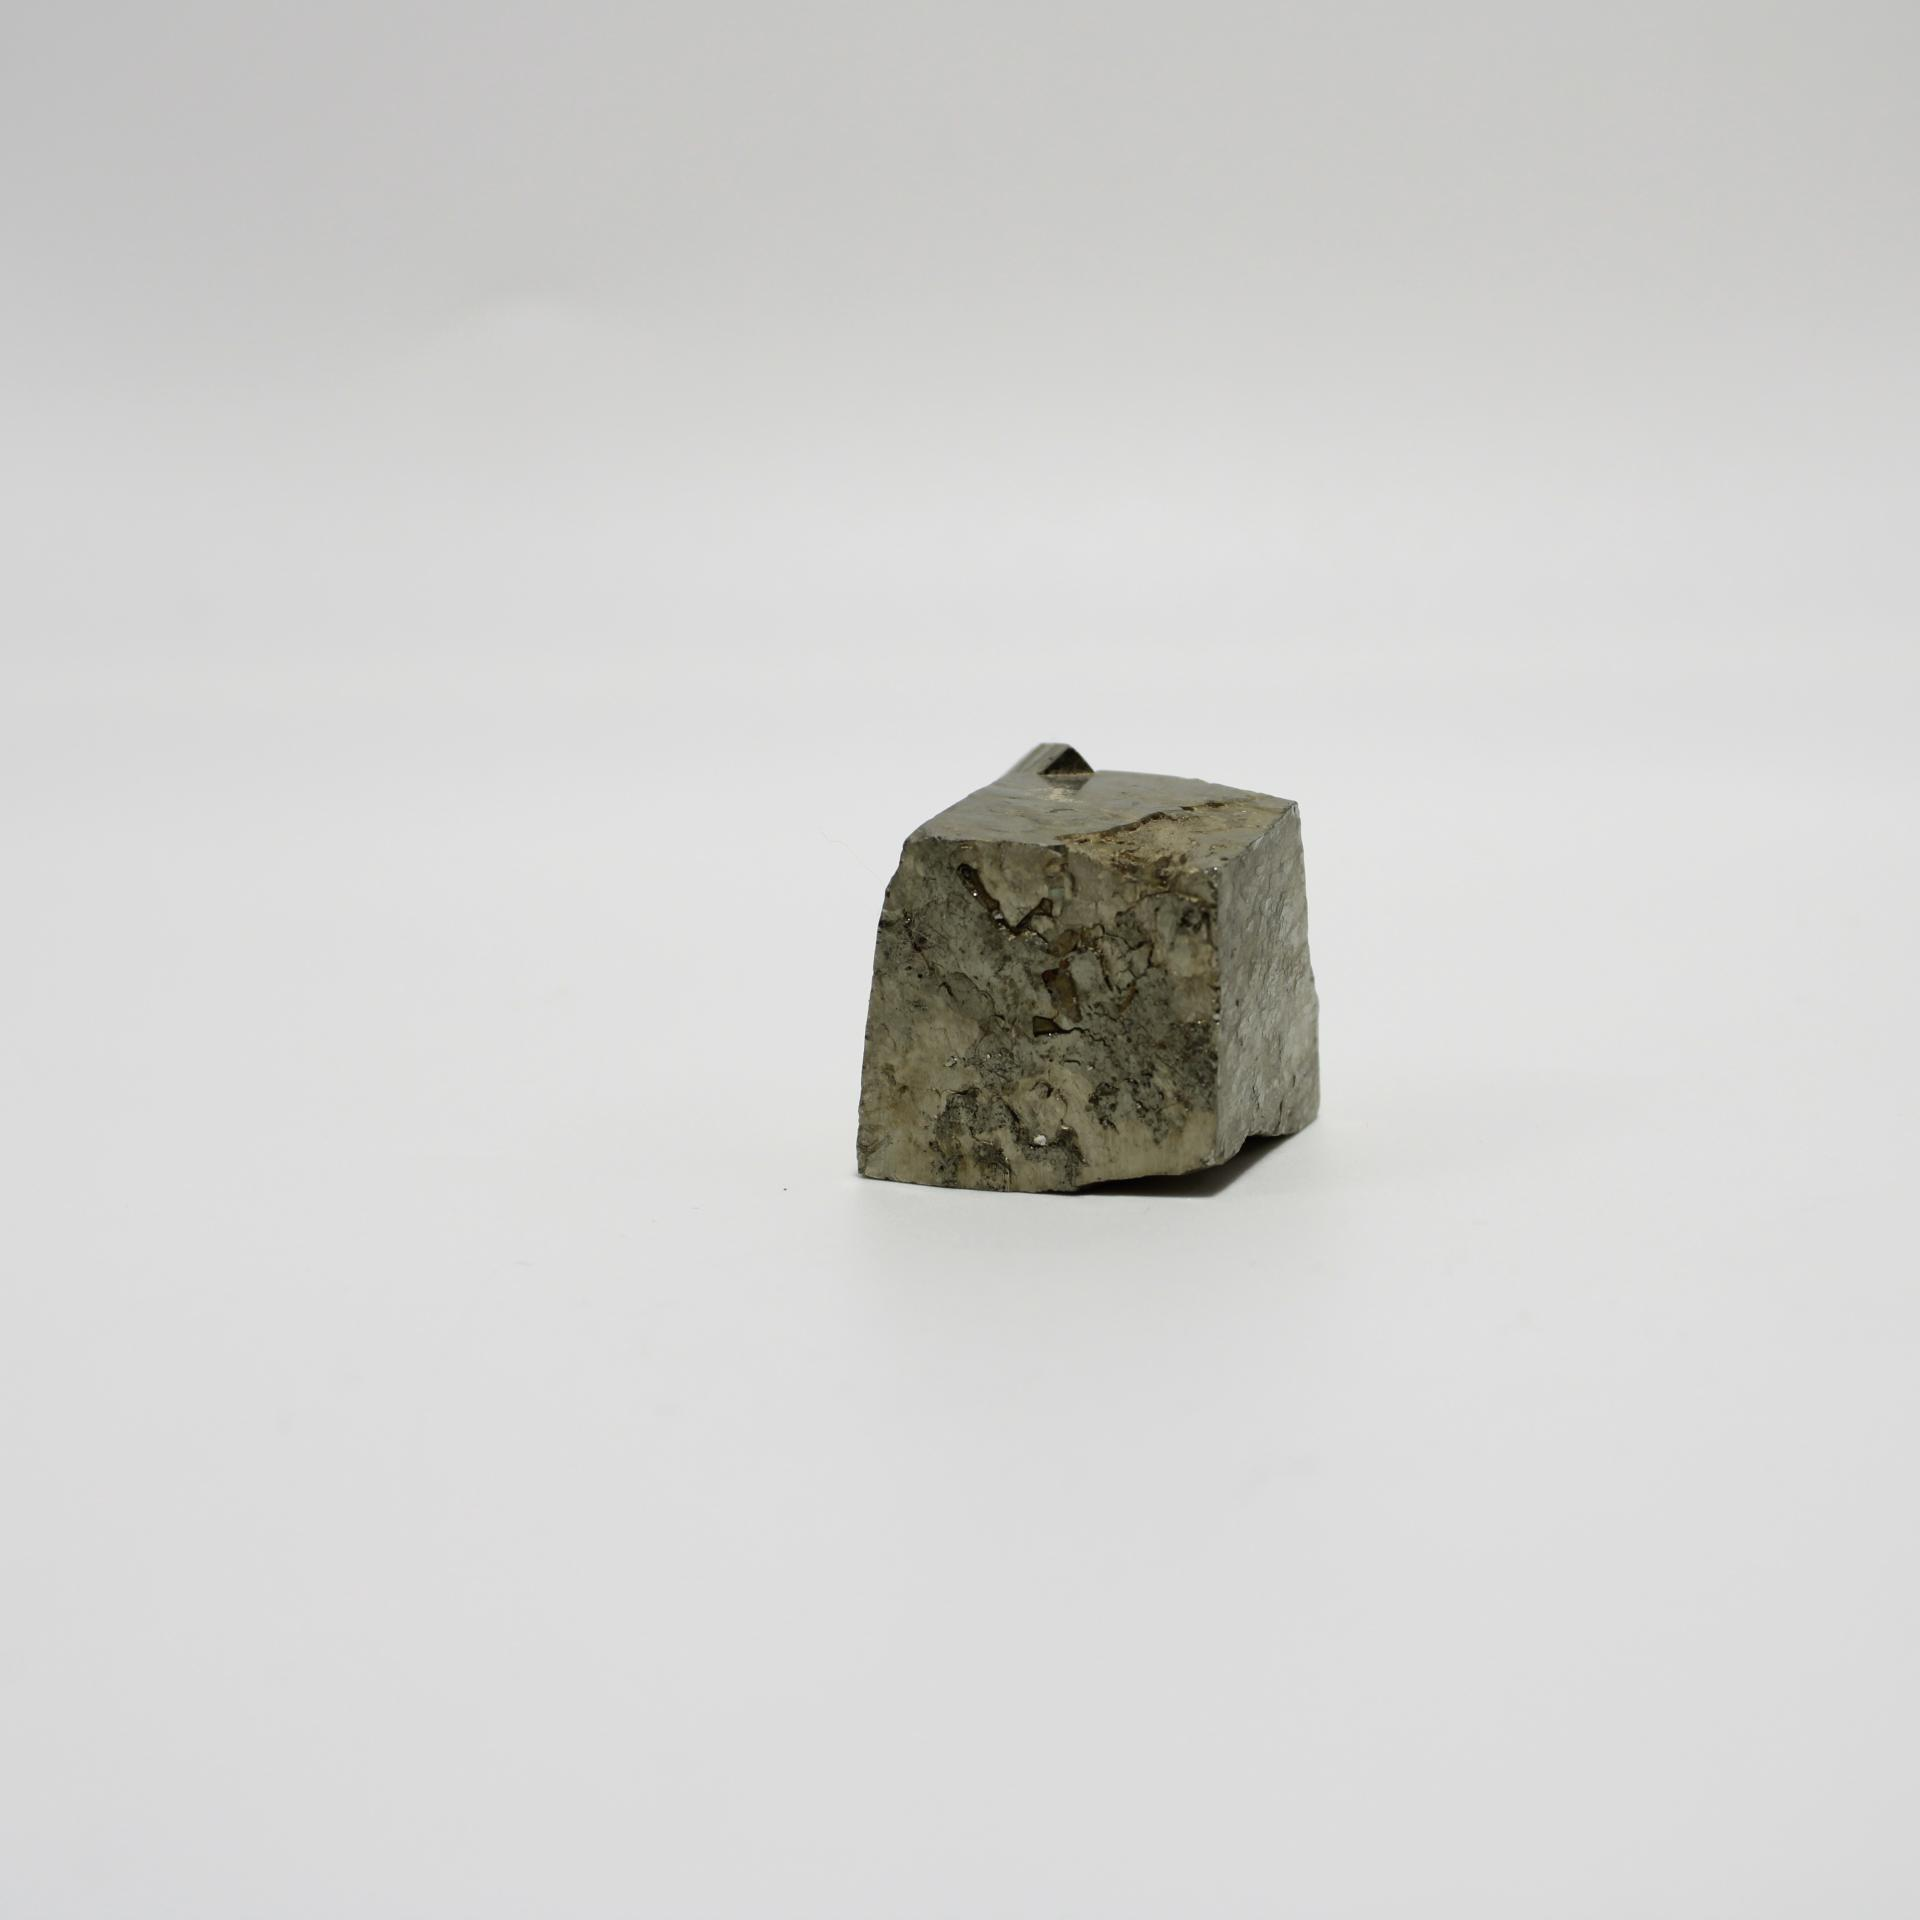 I82 pyritecube 4